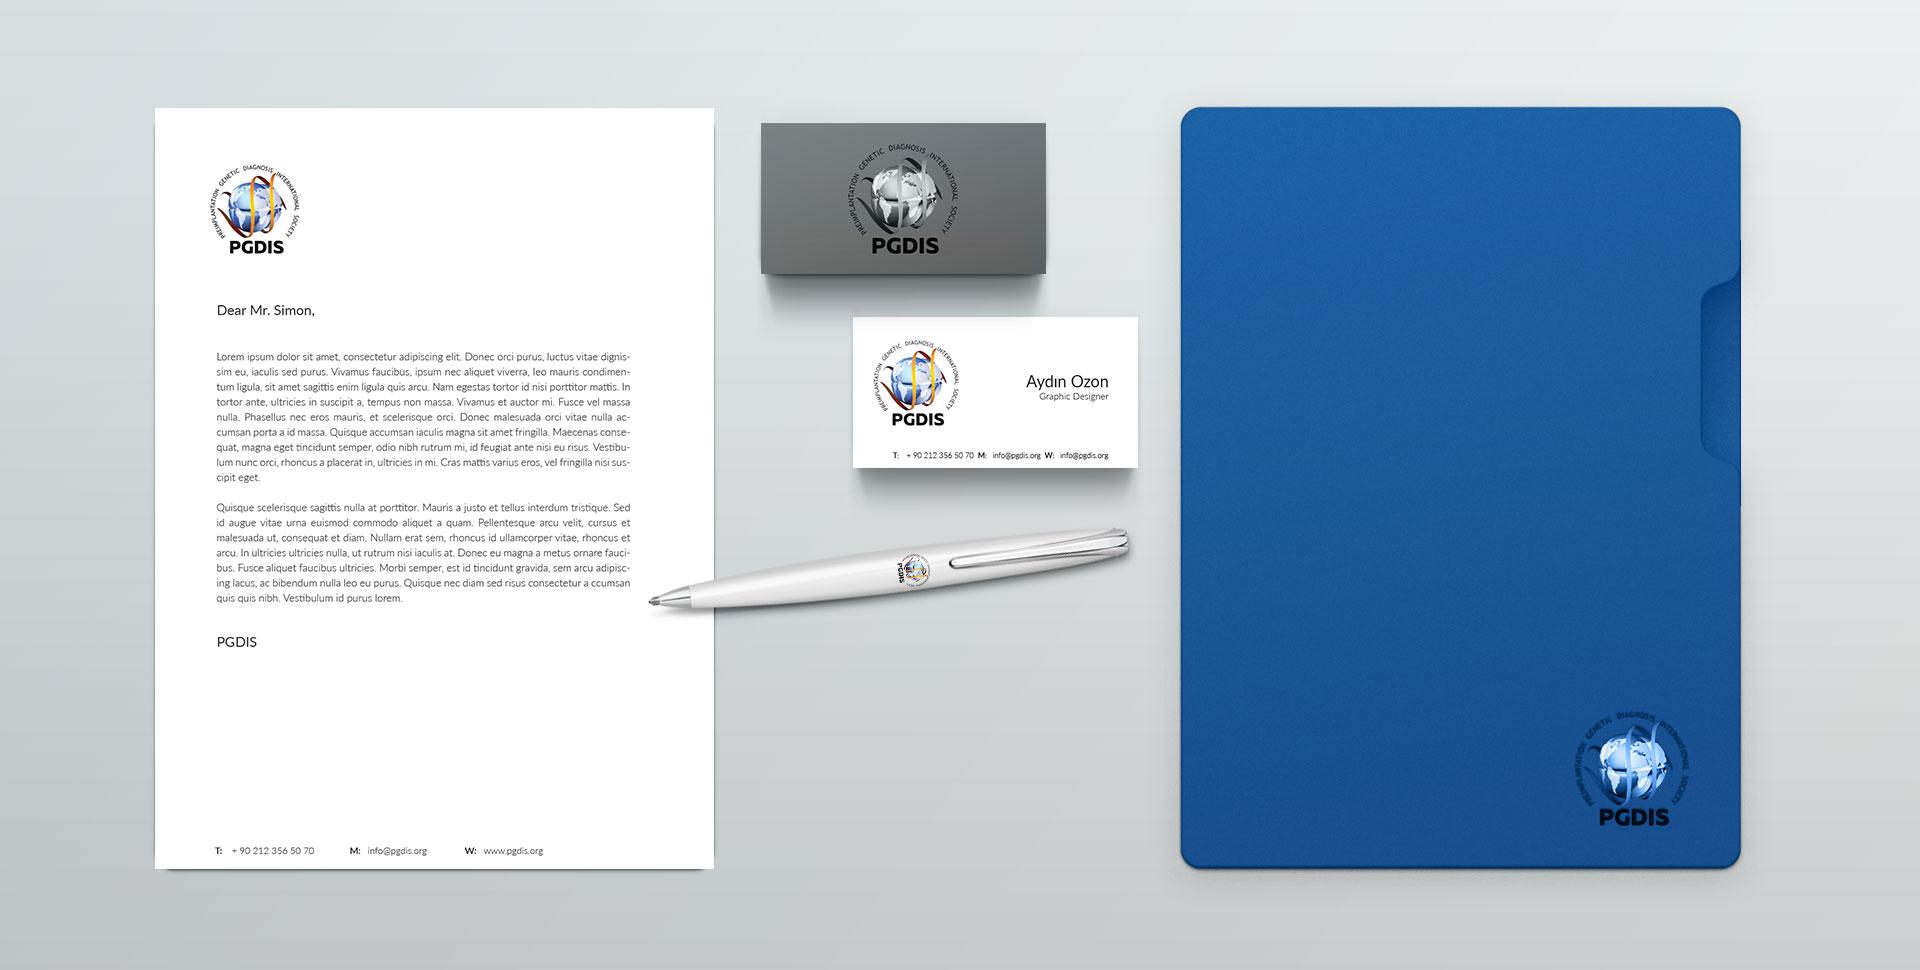 pgdis-logo-brand-isentity-revolando-07